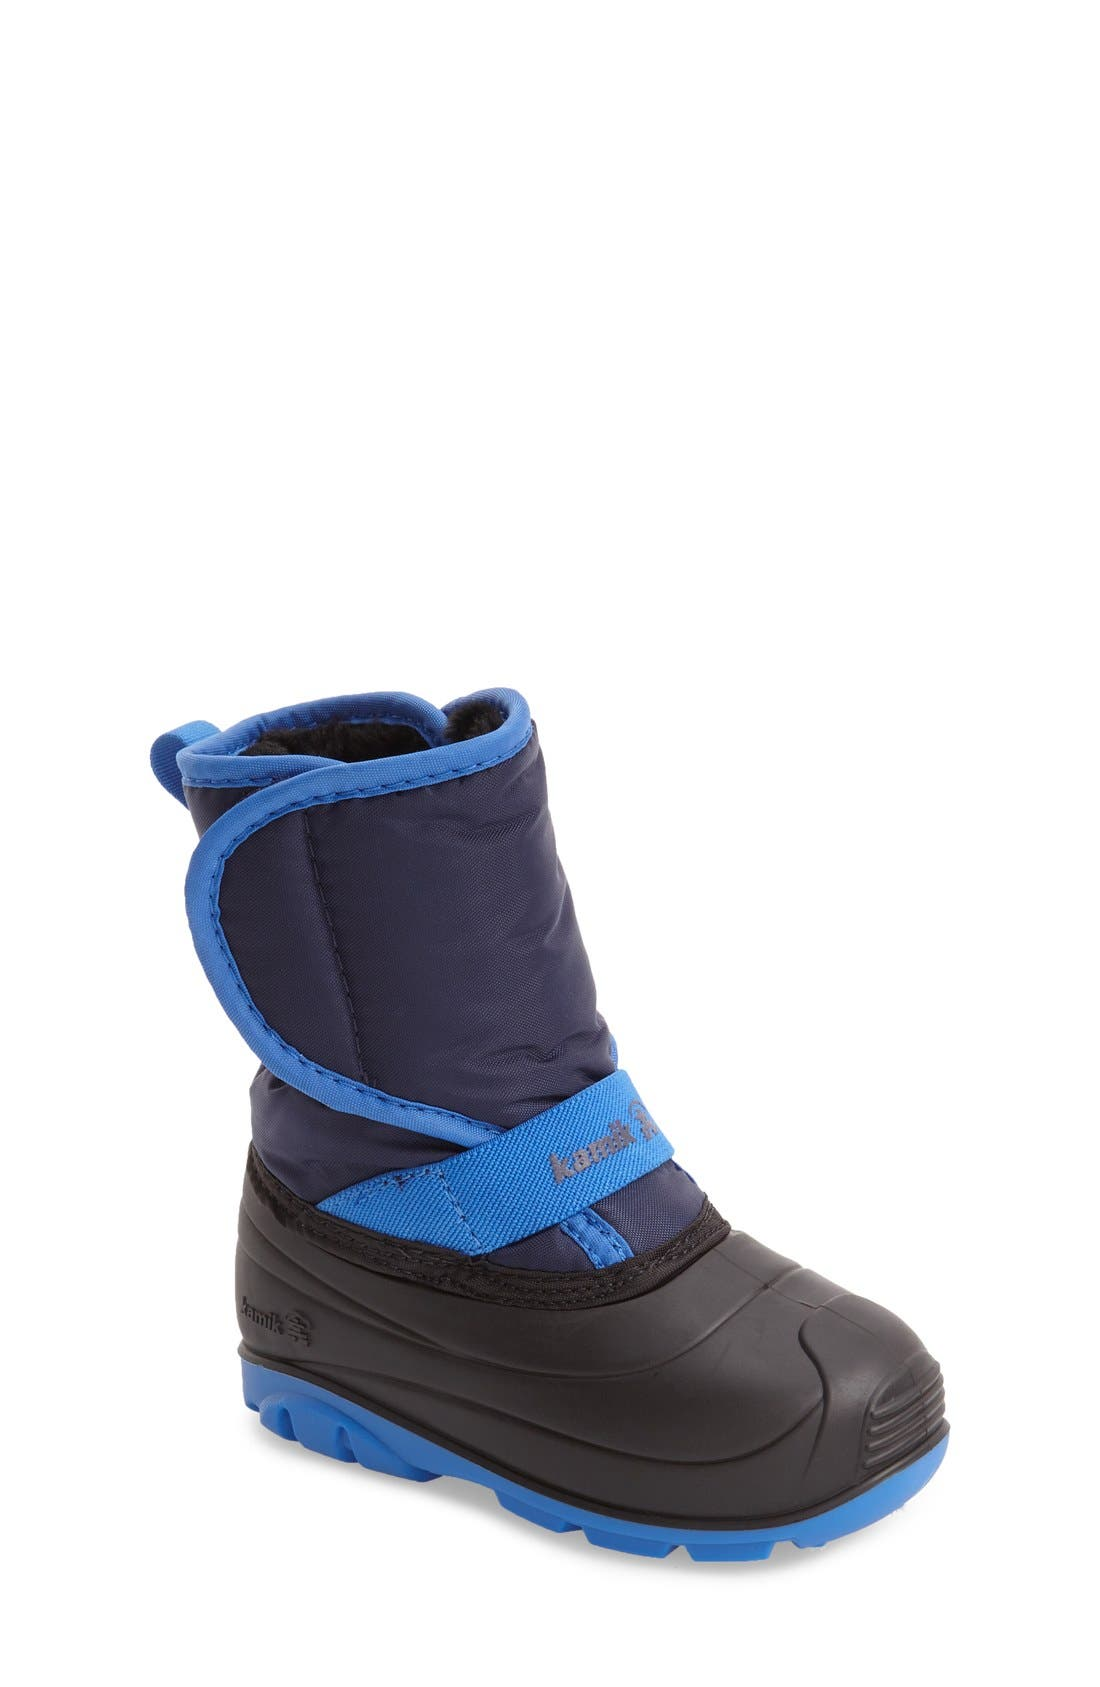 Main Image - Kamik Pika Waterproof Faux Fur Lined Snow Boot (Walker & Toddler)